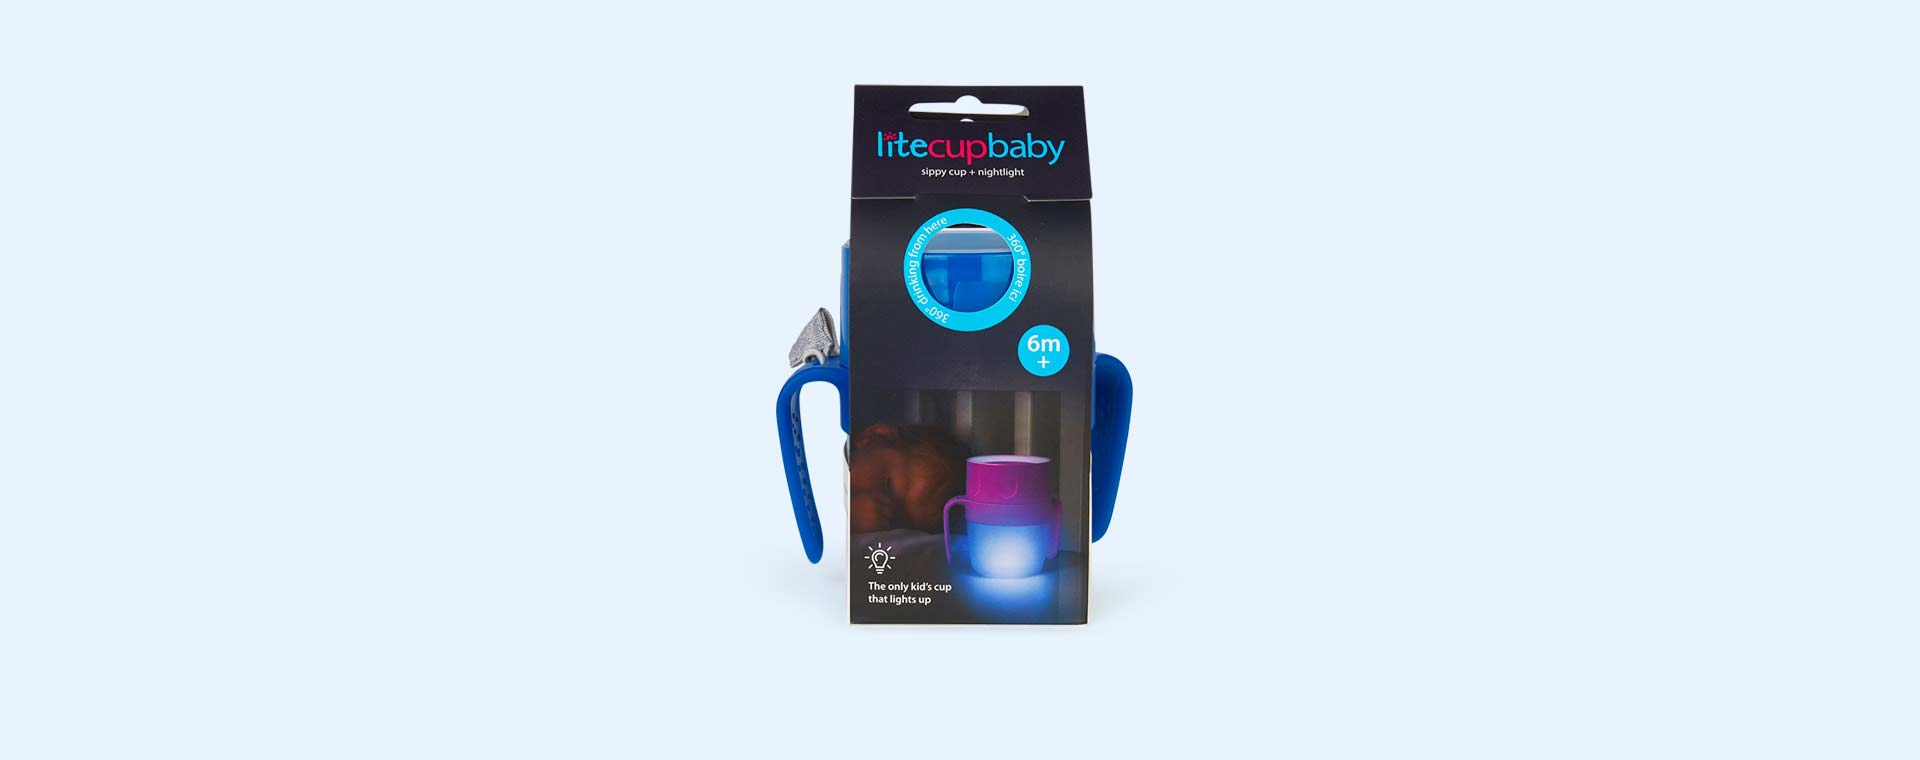 Uber Blue litecup Litecup Baby